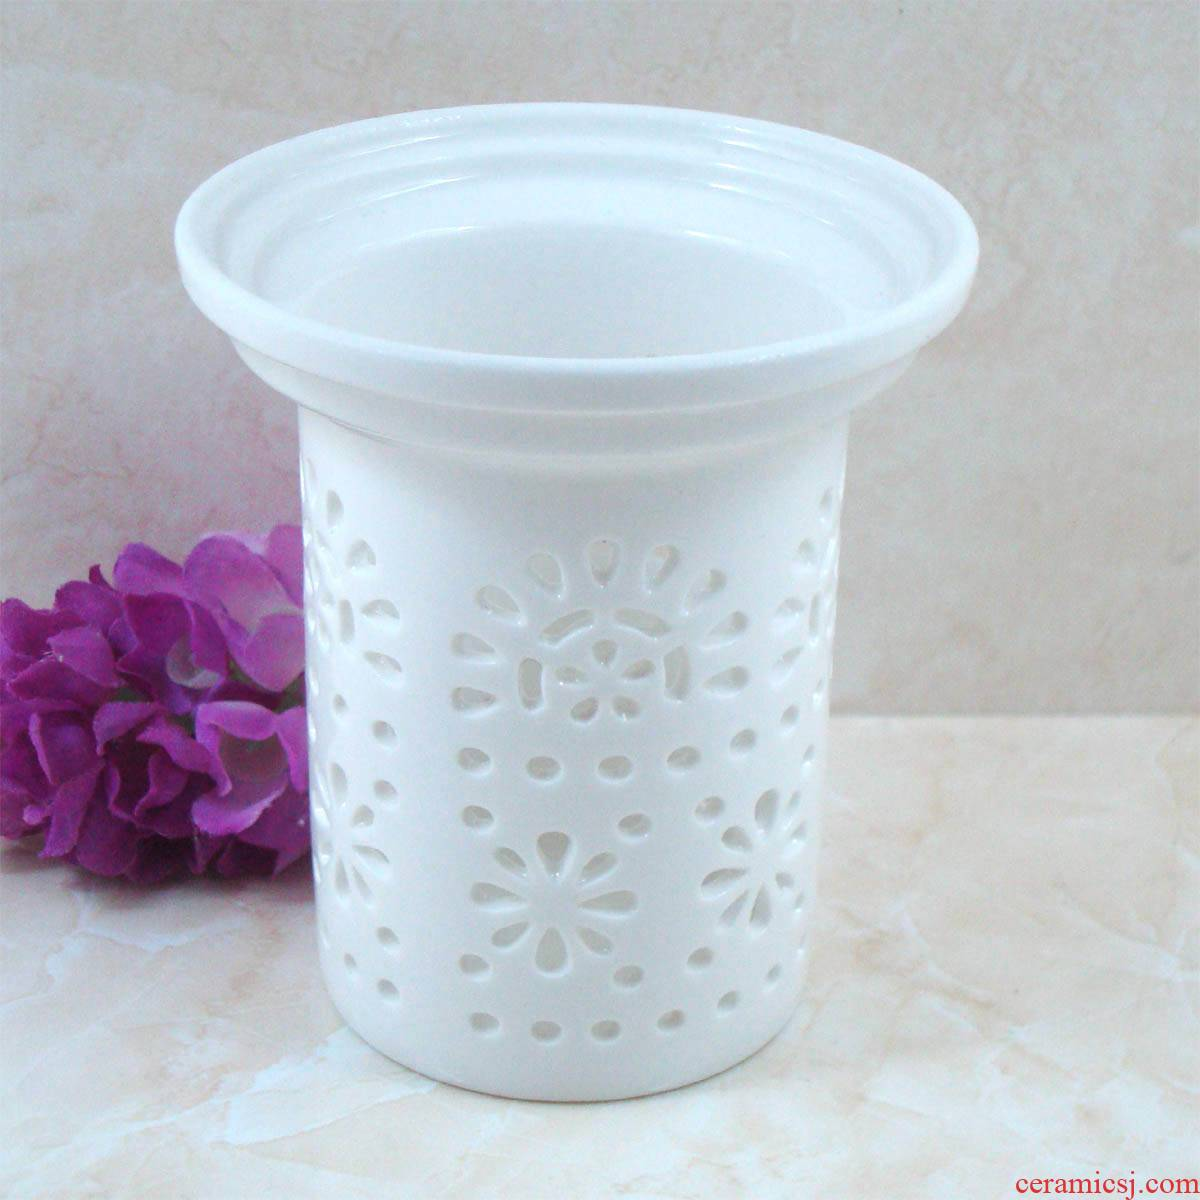 Ceramic teapot filter) tea strainer every tea net kung fu tea accessories carving flower tea filter mercifully.net